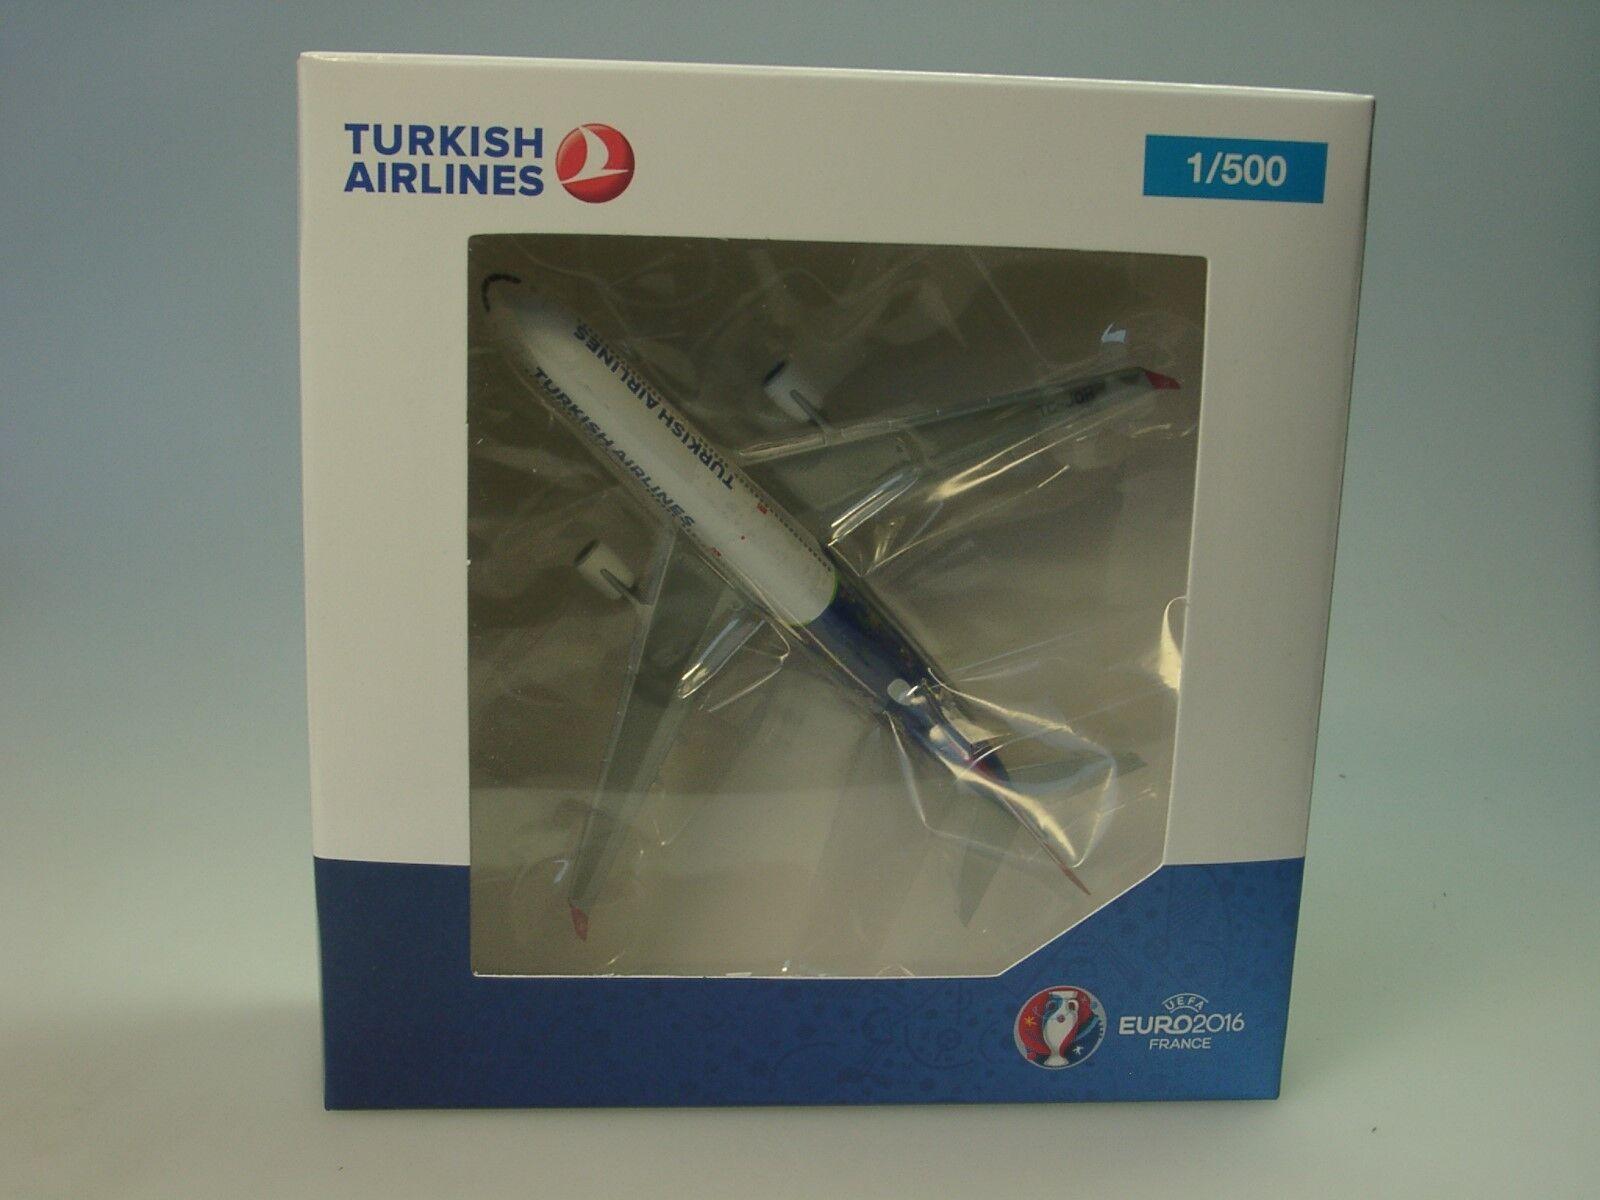 HERPA HERPA HERPA wings Airbus a330-300 turkish Airlines  em 2016  - 529556 - 1 500 8f56cd